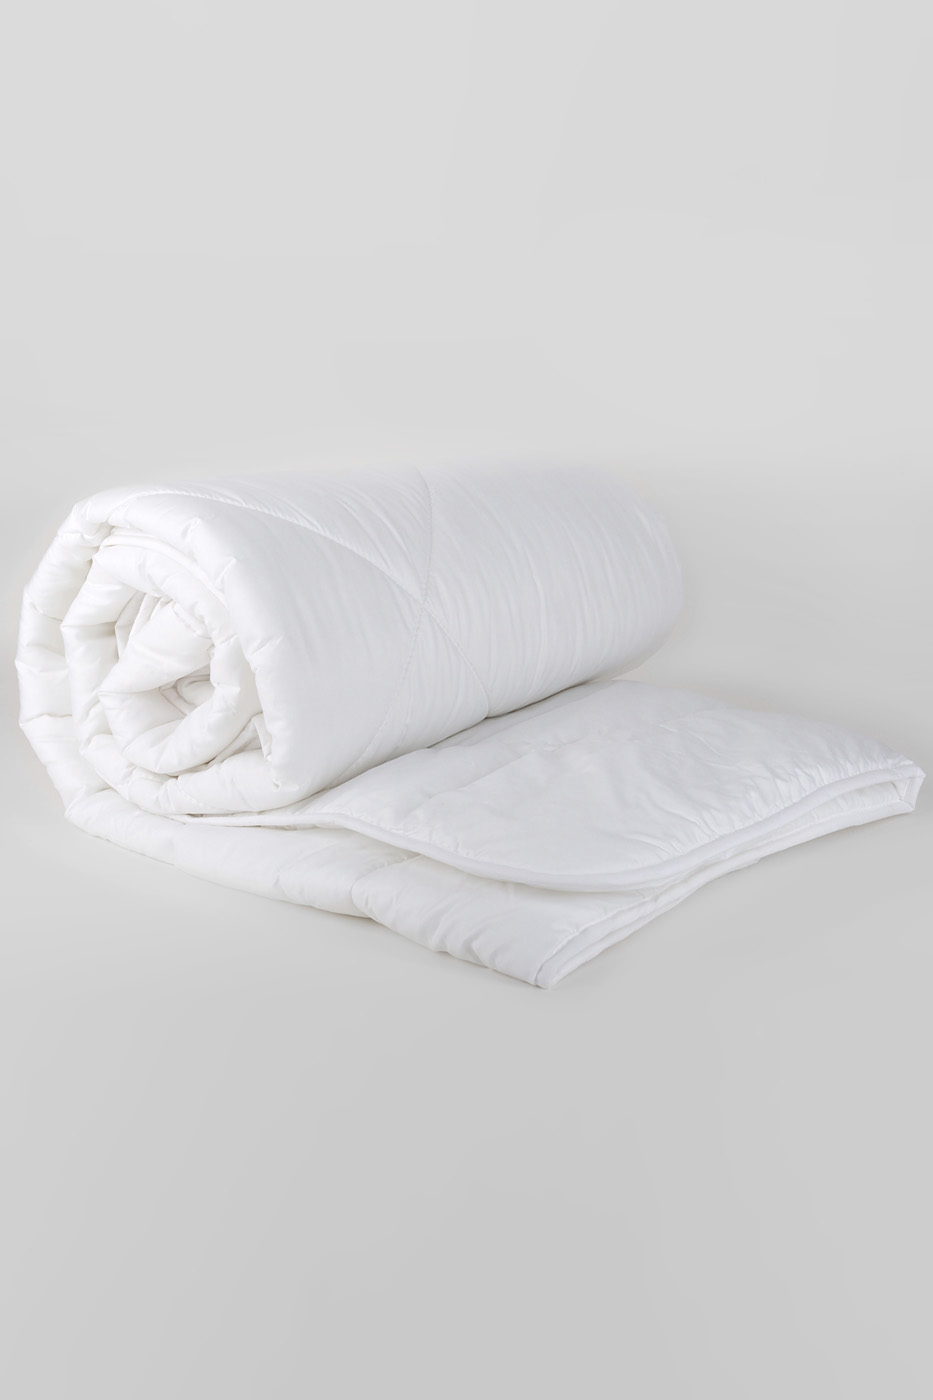 Одеяла CLASSIC by T Одеяло Дзен Тенцель Легкое (200х210 см) togas одеяла дзен тенцель